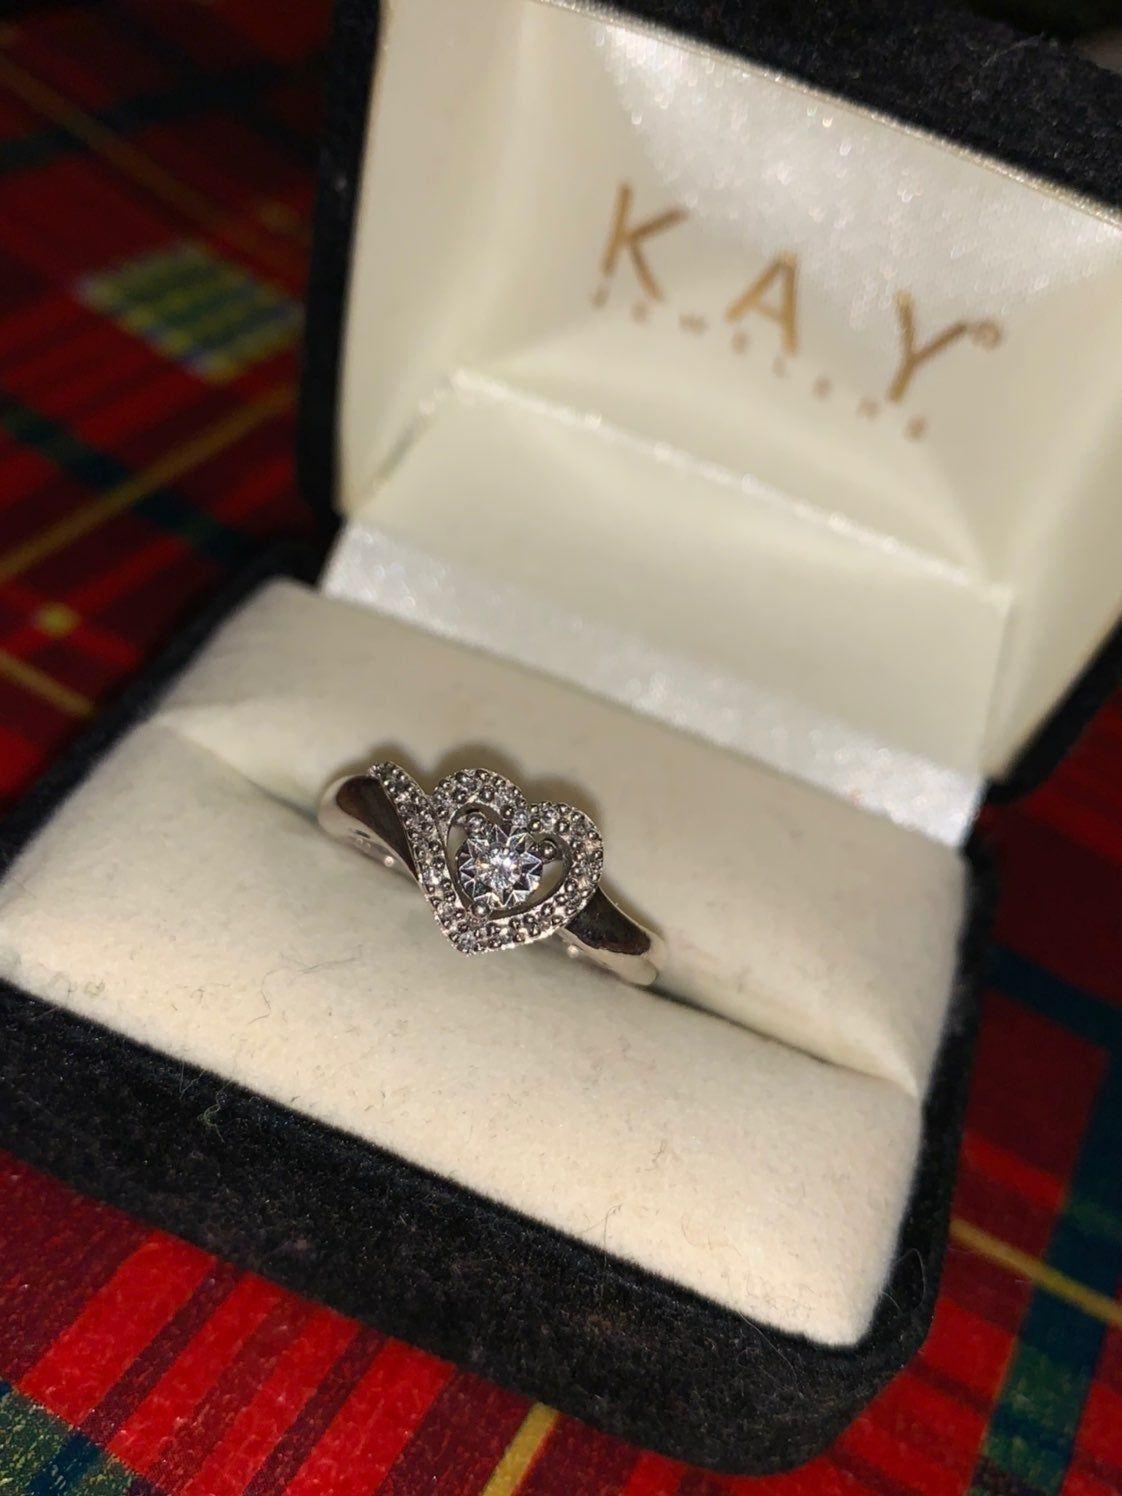 Heart Promise Ring Size 7 5 On Mercari Kay Jewelers Rings Heart Promise Rings Heart Shaped Diamond